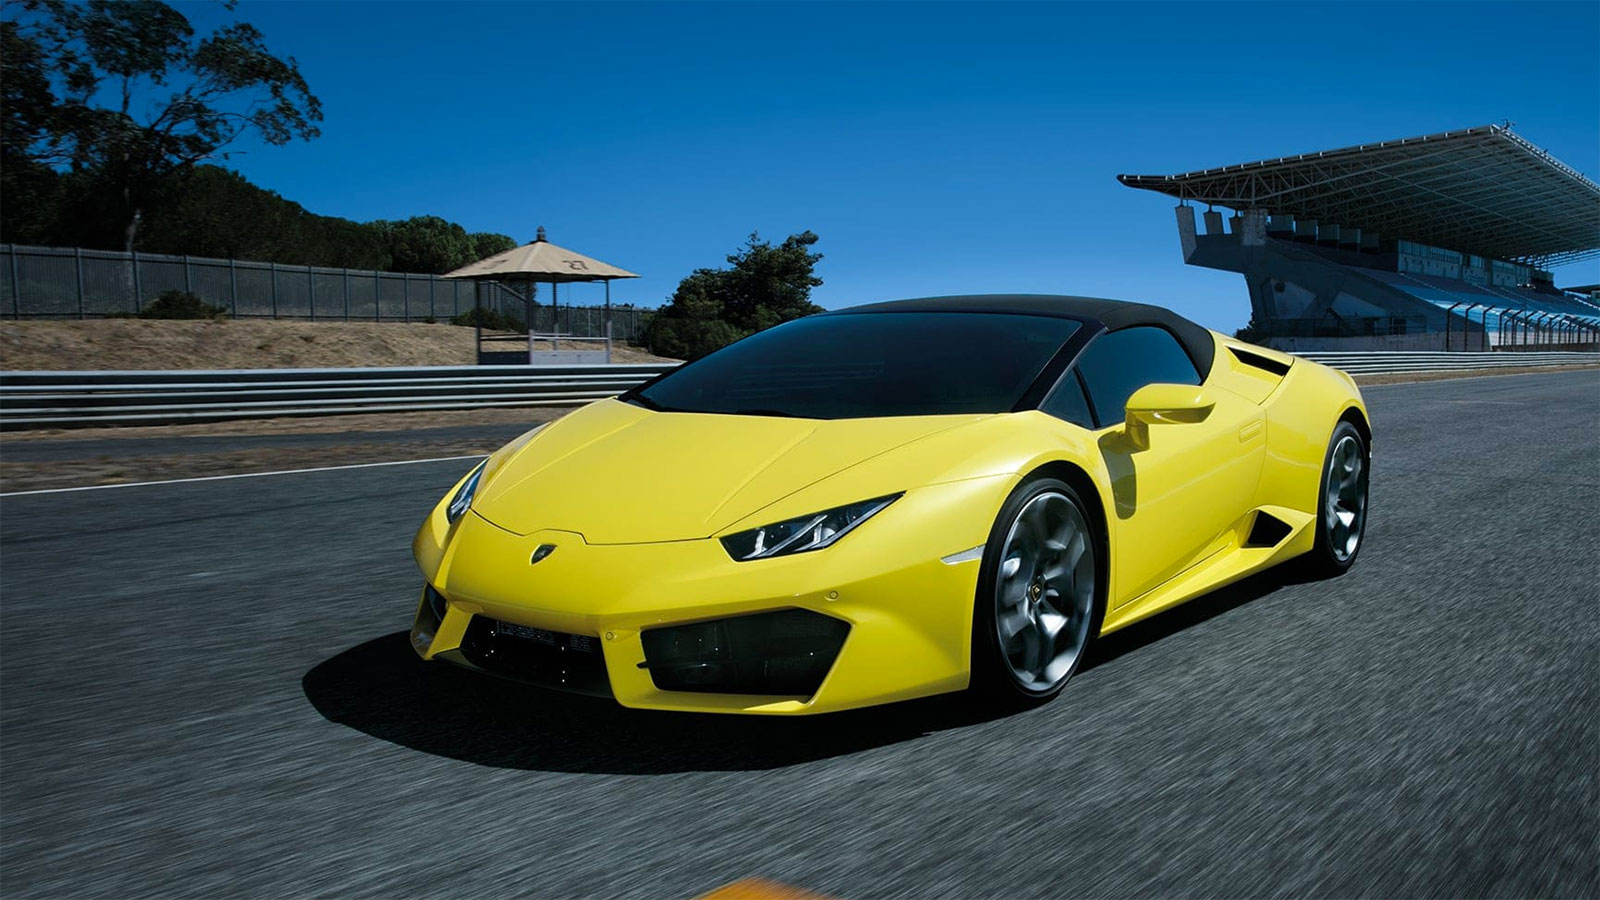 Lamborghini Huracan RWD Spyder - Breathtaking Technology image 1